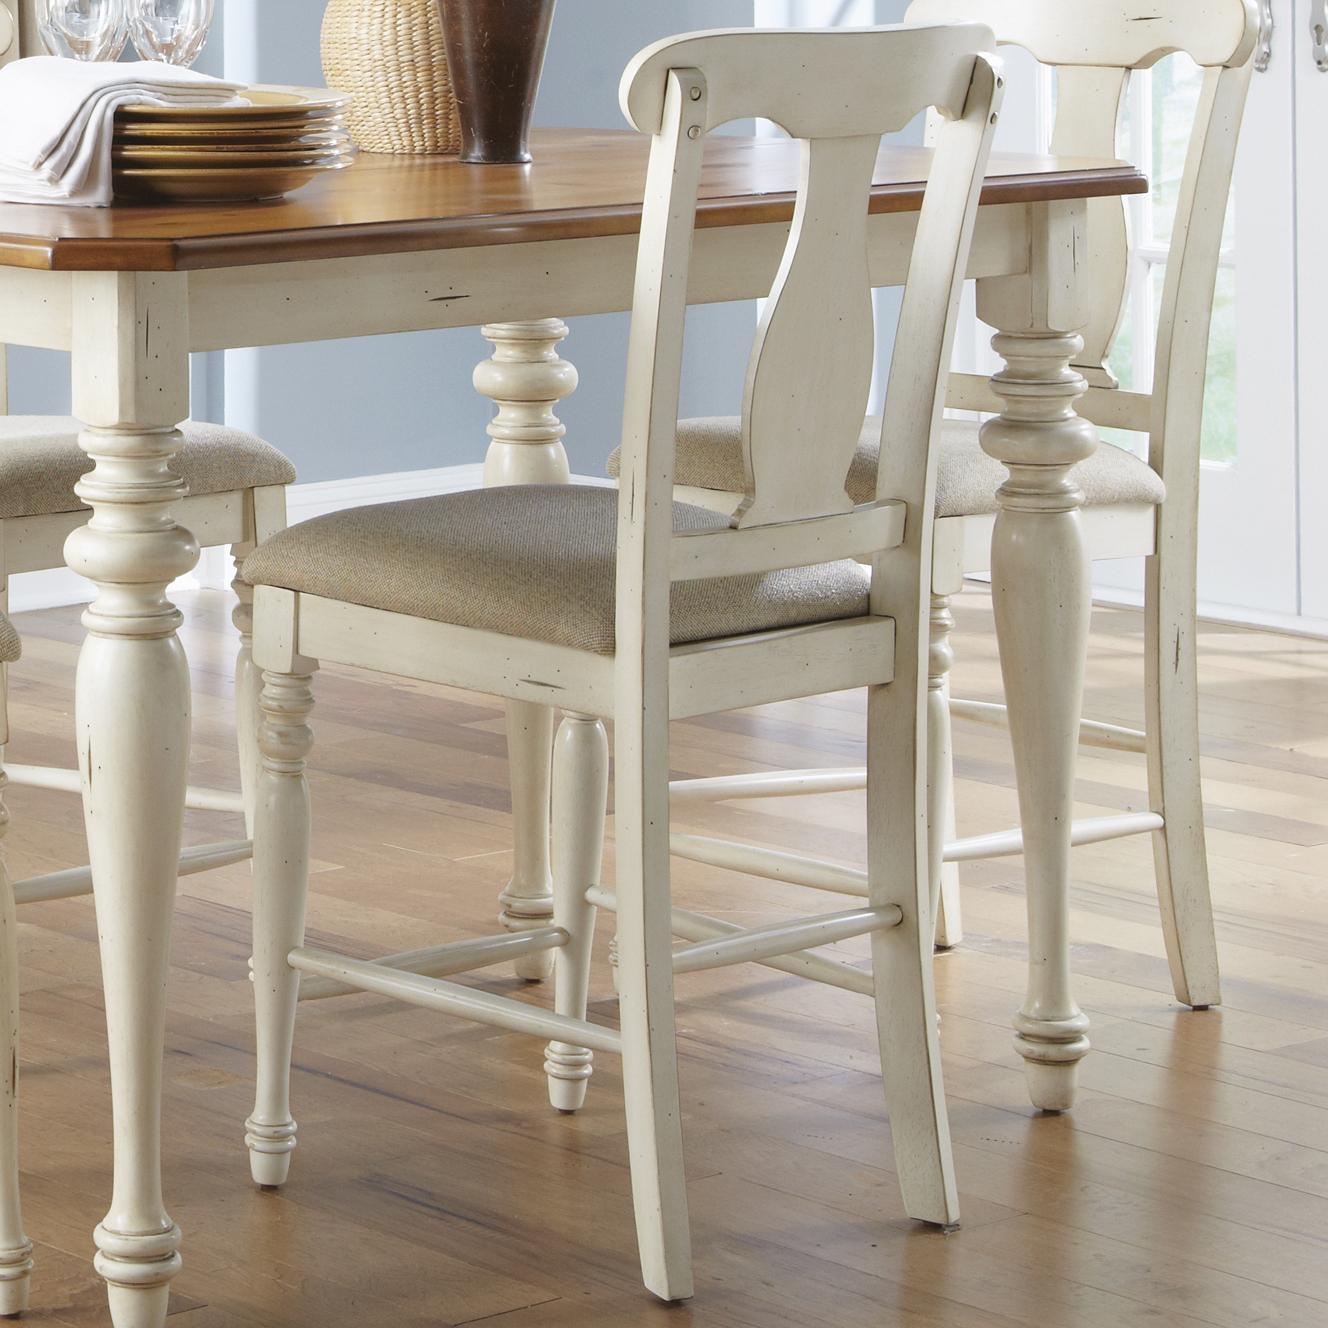 Liberty furniture ocean isle counter height stool item number 303 b250124